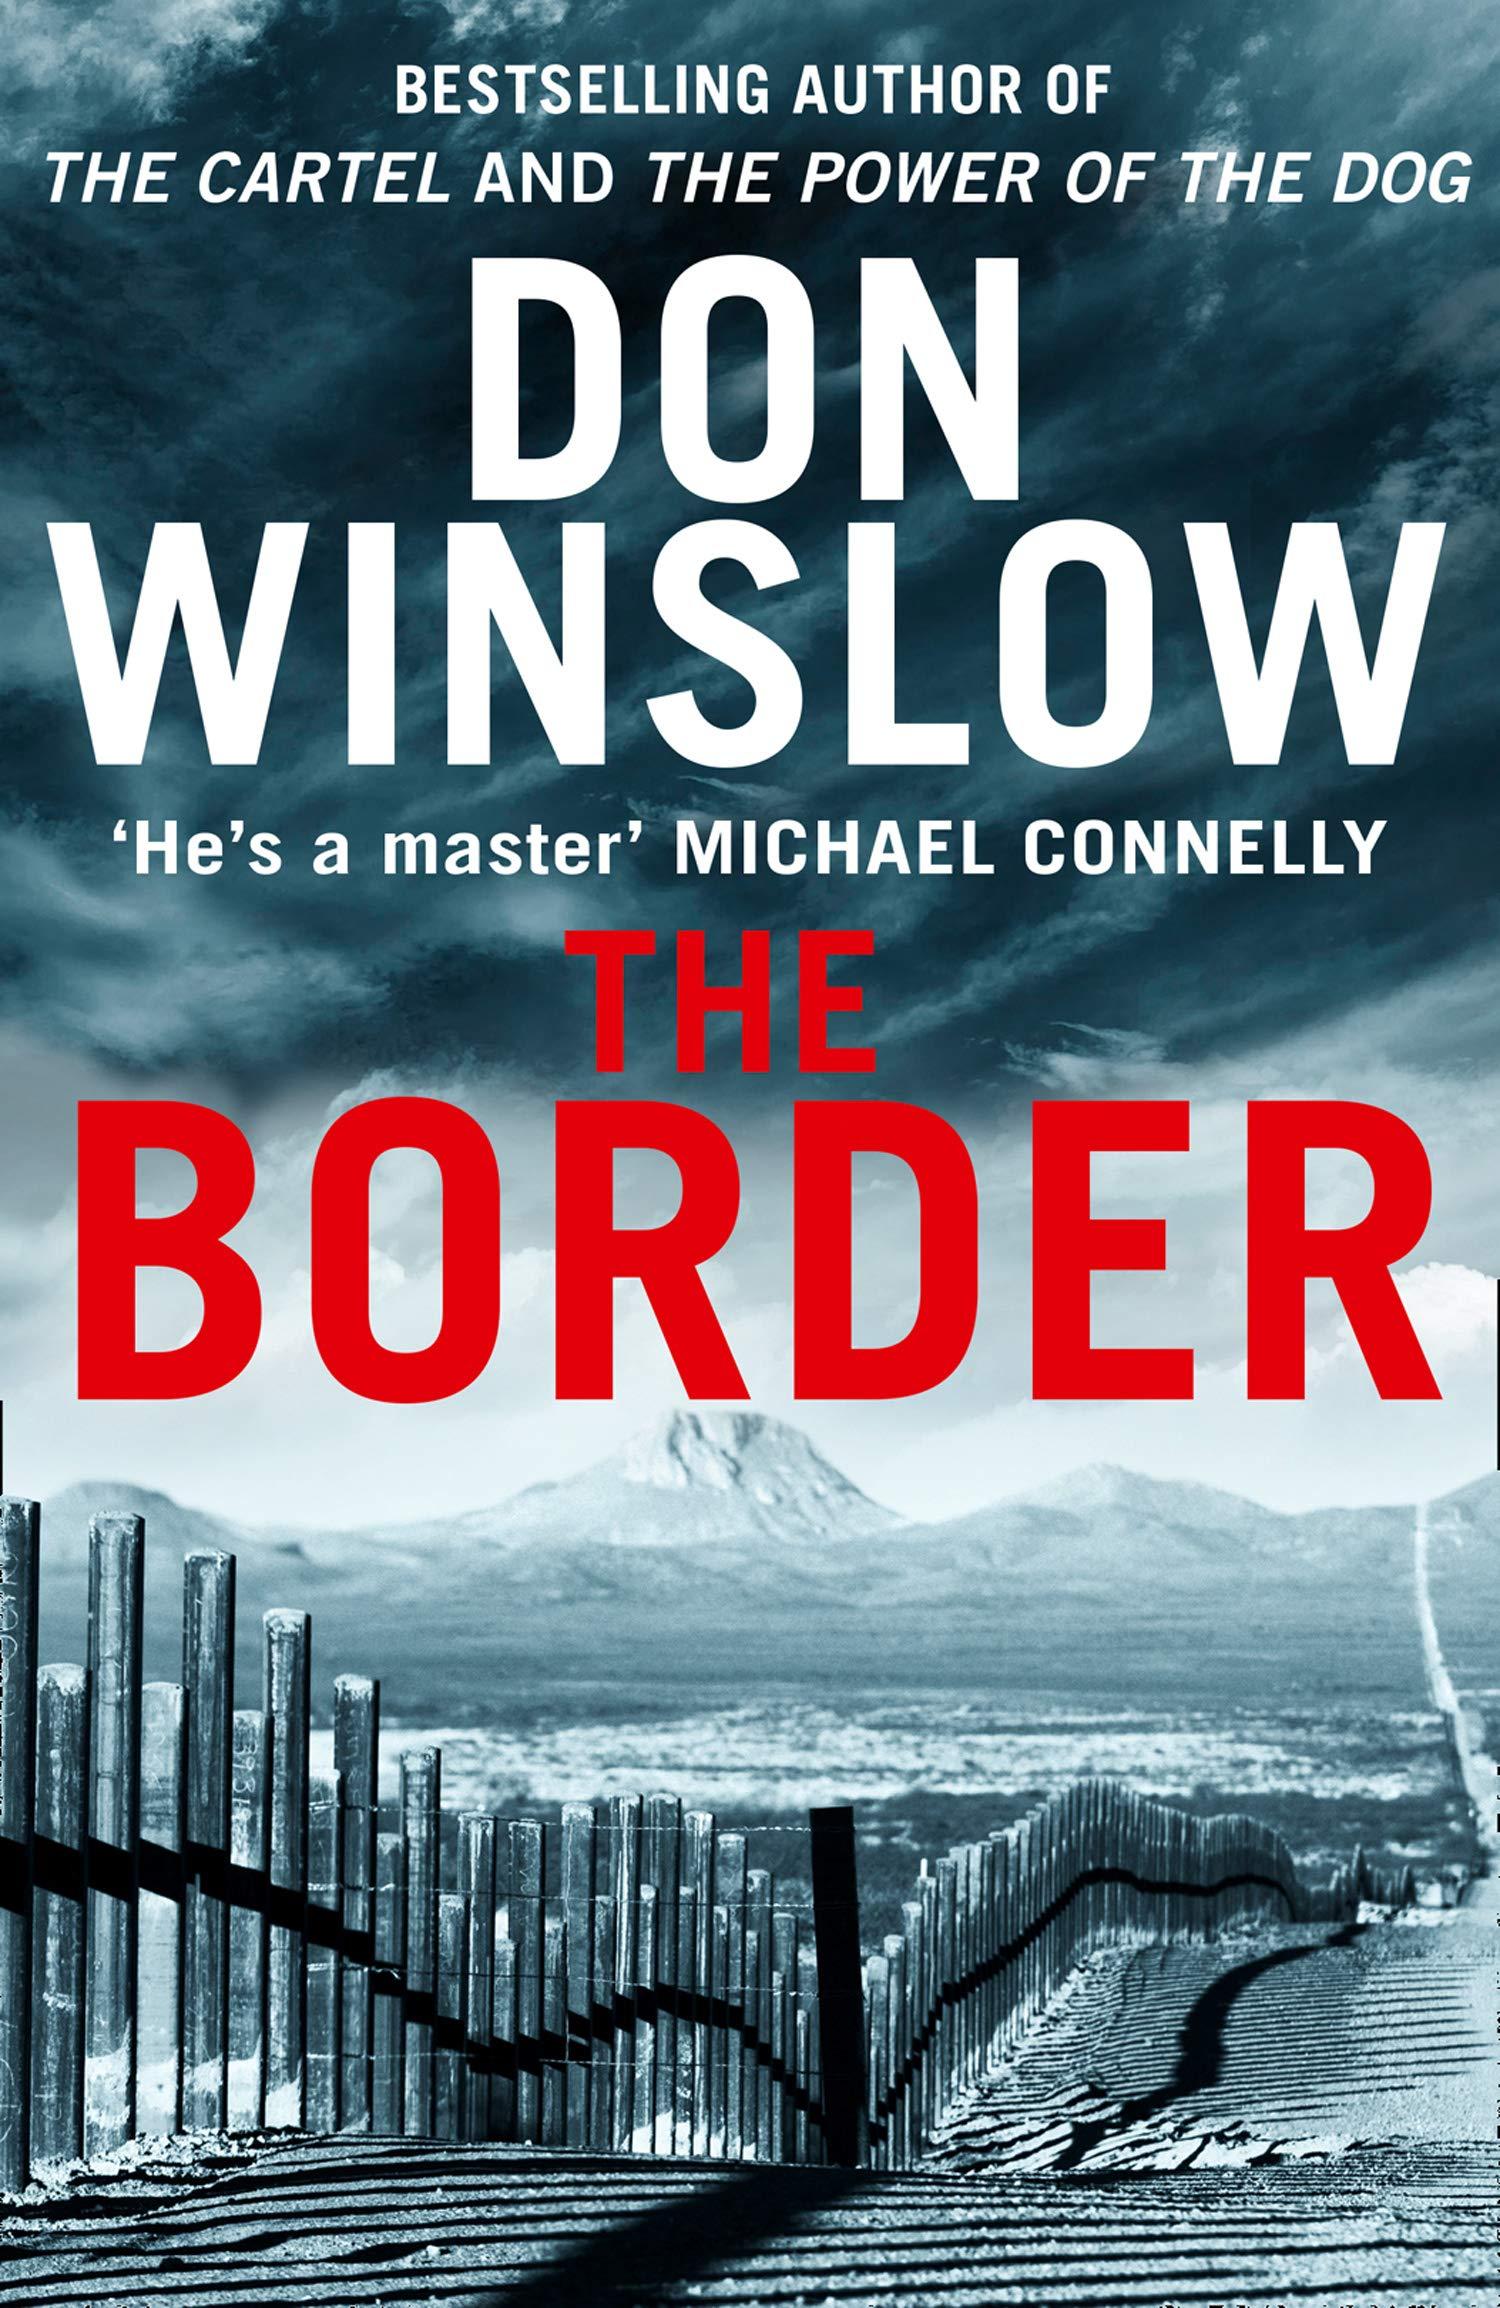 Amazon.com: The Border (9780008227531): Don Winslow: Books